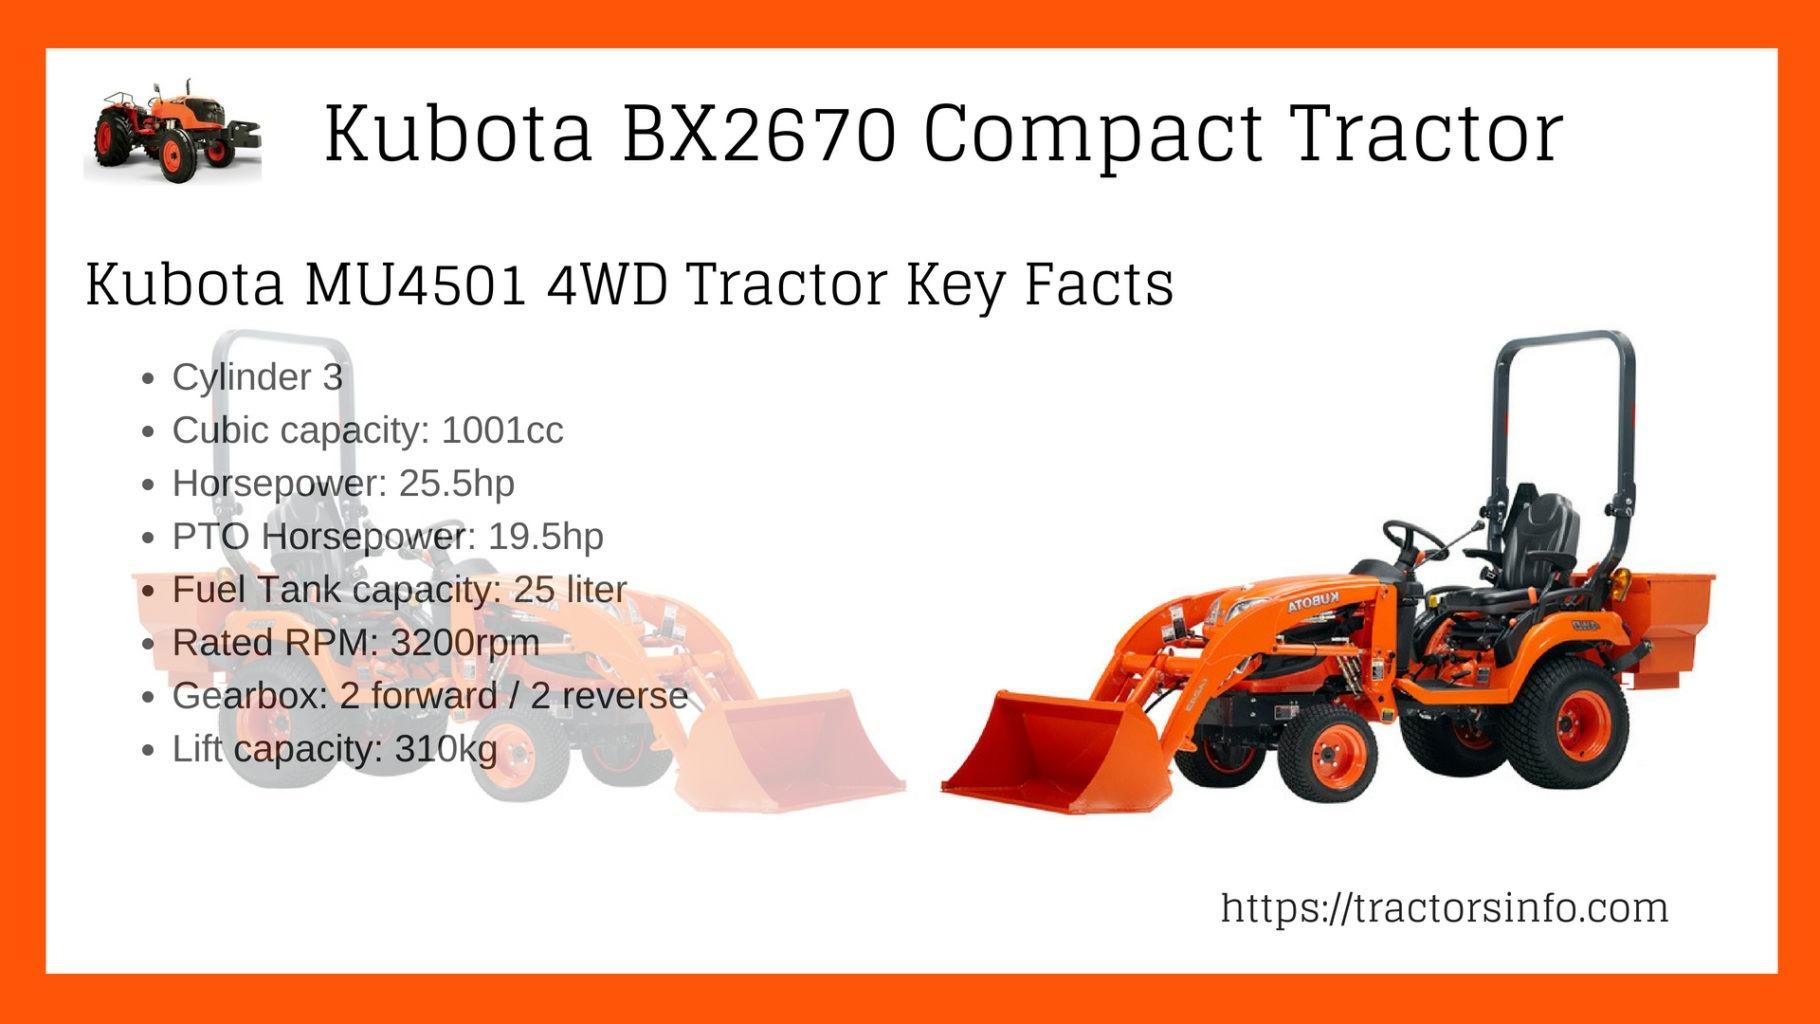 Kubota-BX2670-Compact-Tractor